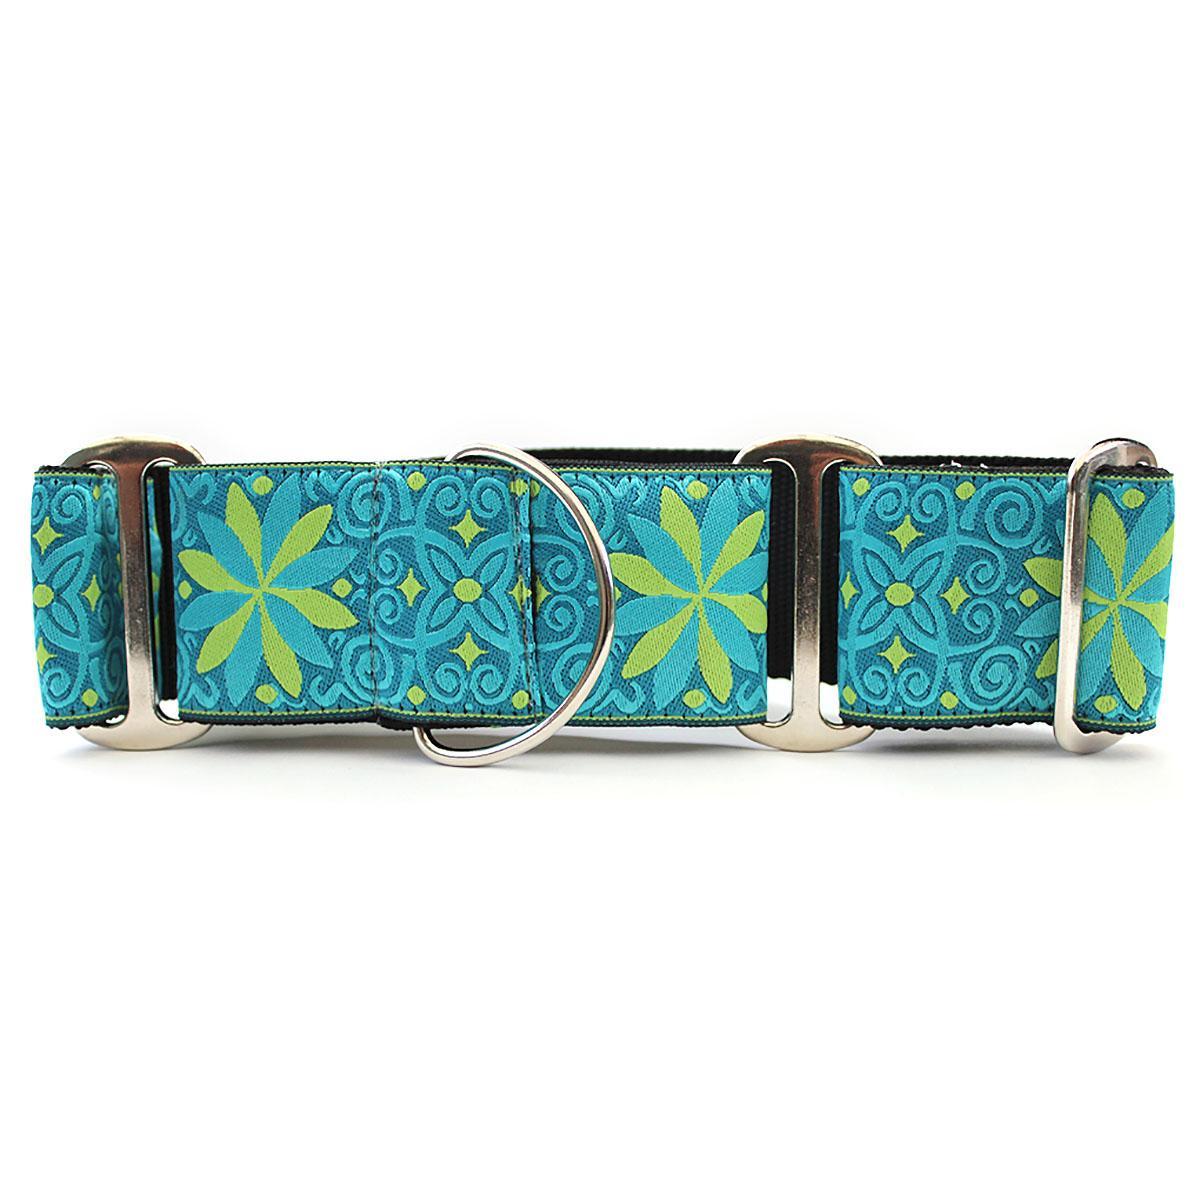 Pinwheel Wide Martingale Dog Collar by Diva Dog - Caribbean Blue